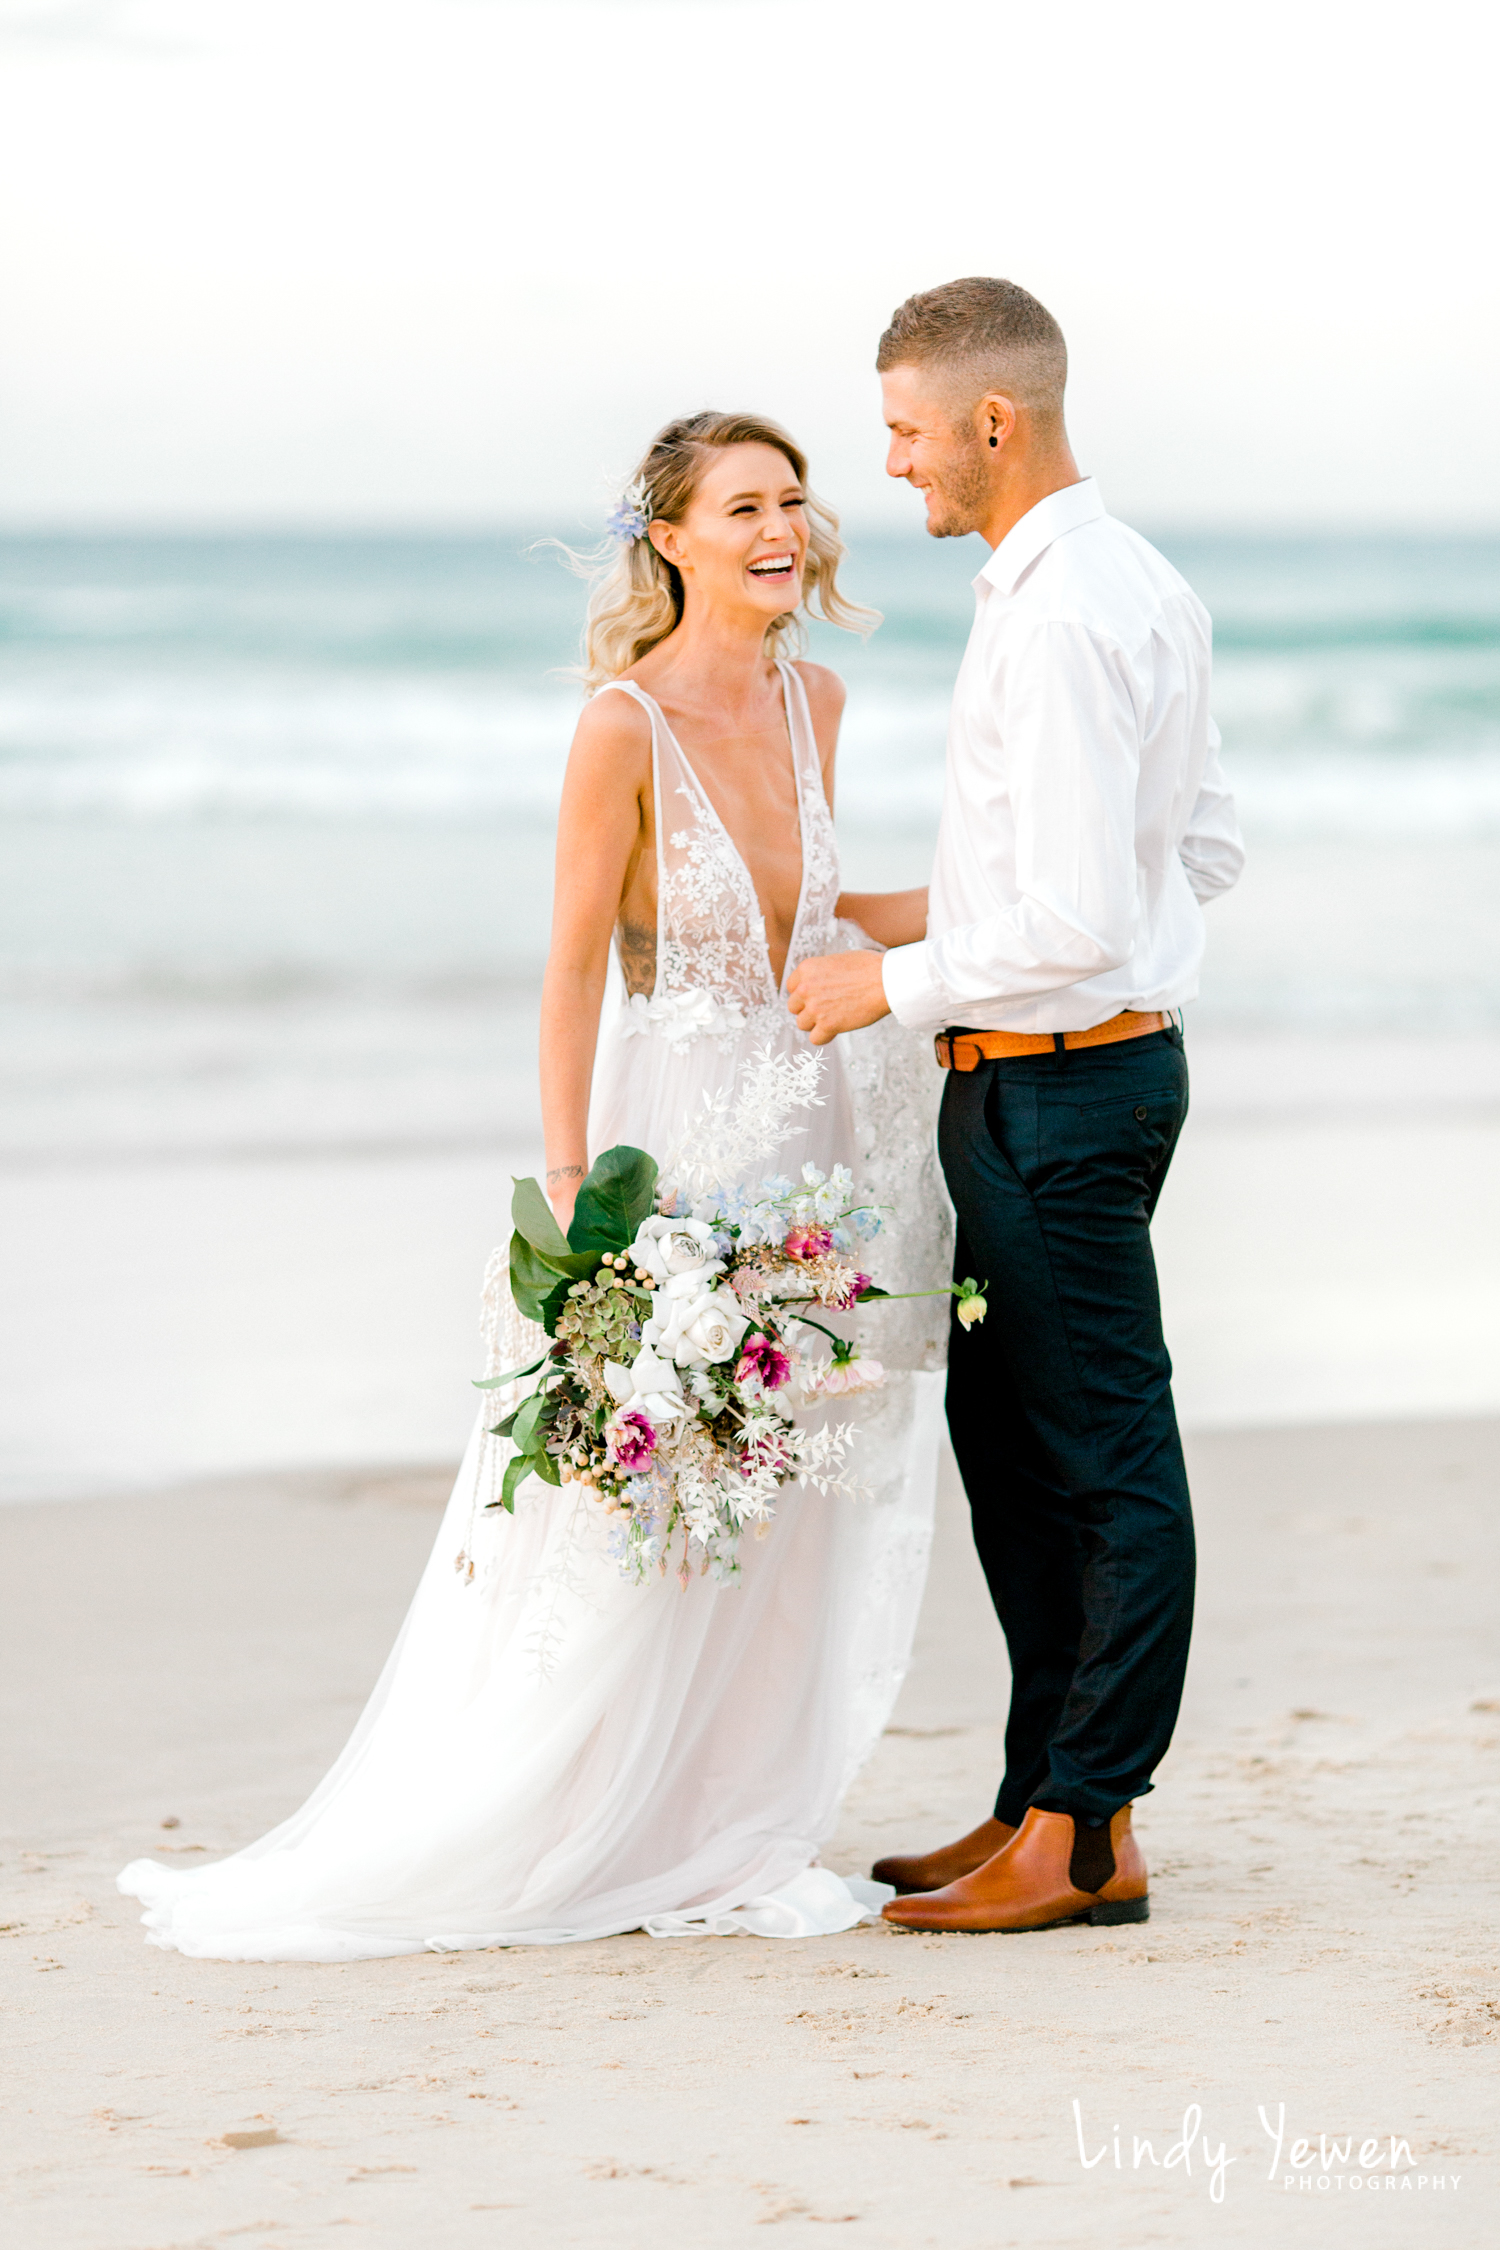 Lindy-Photography-Noosa-Weddings-Grace-Chris 265.jpg